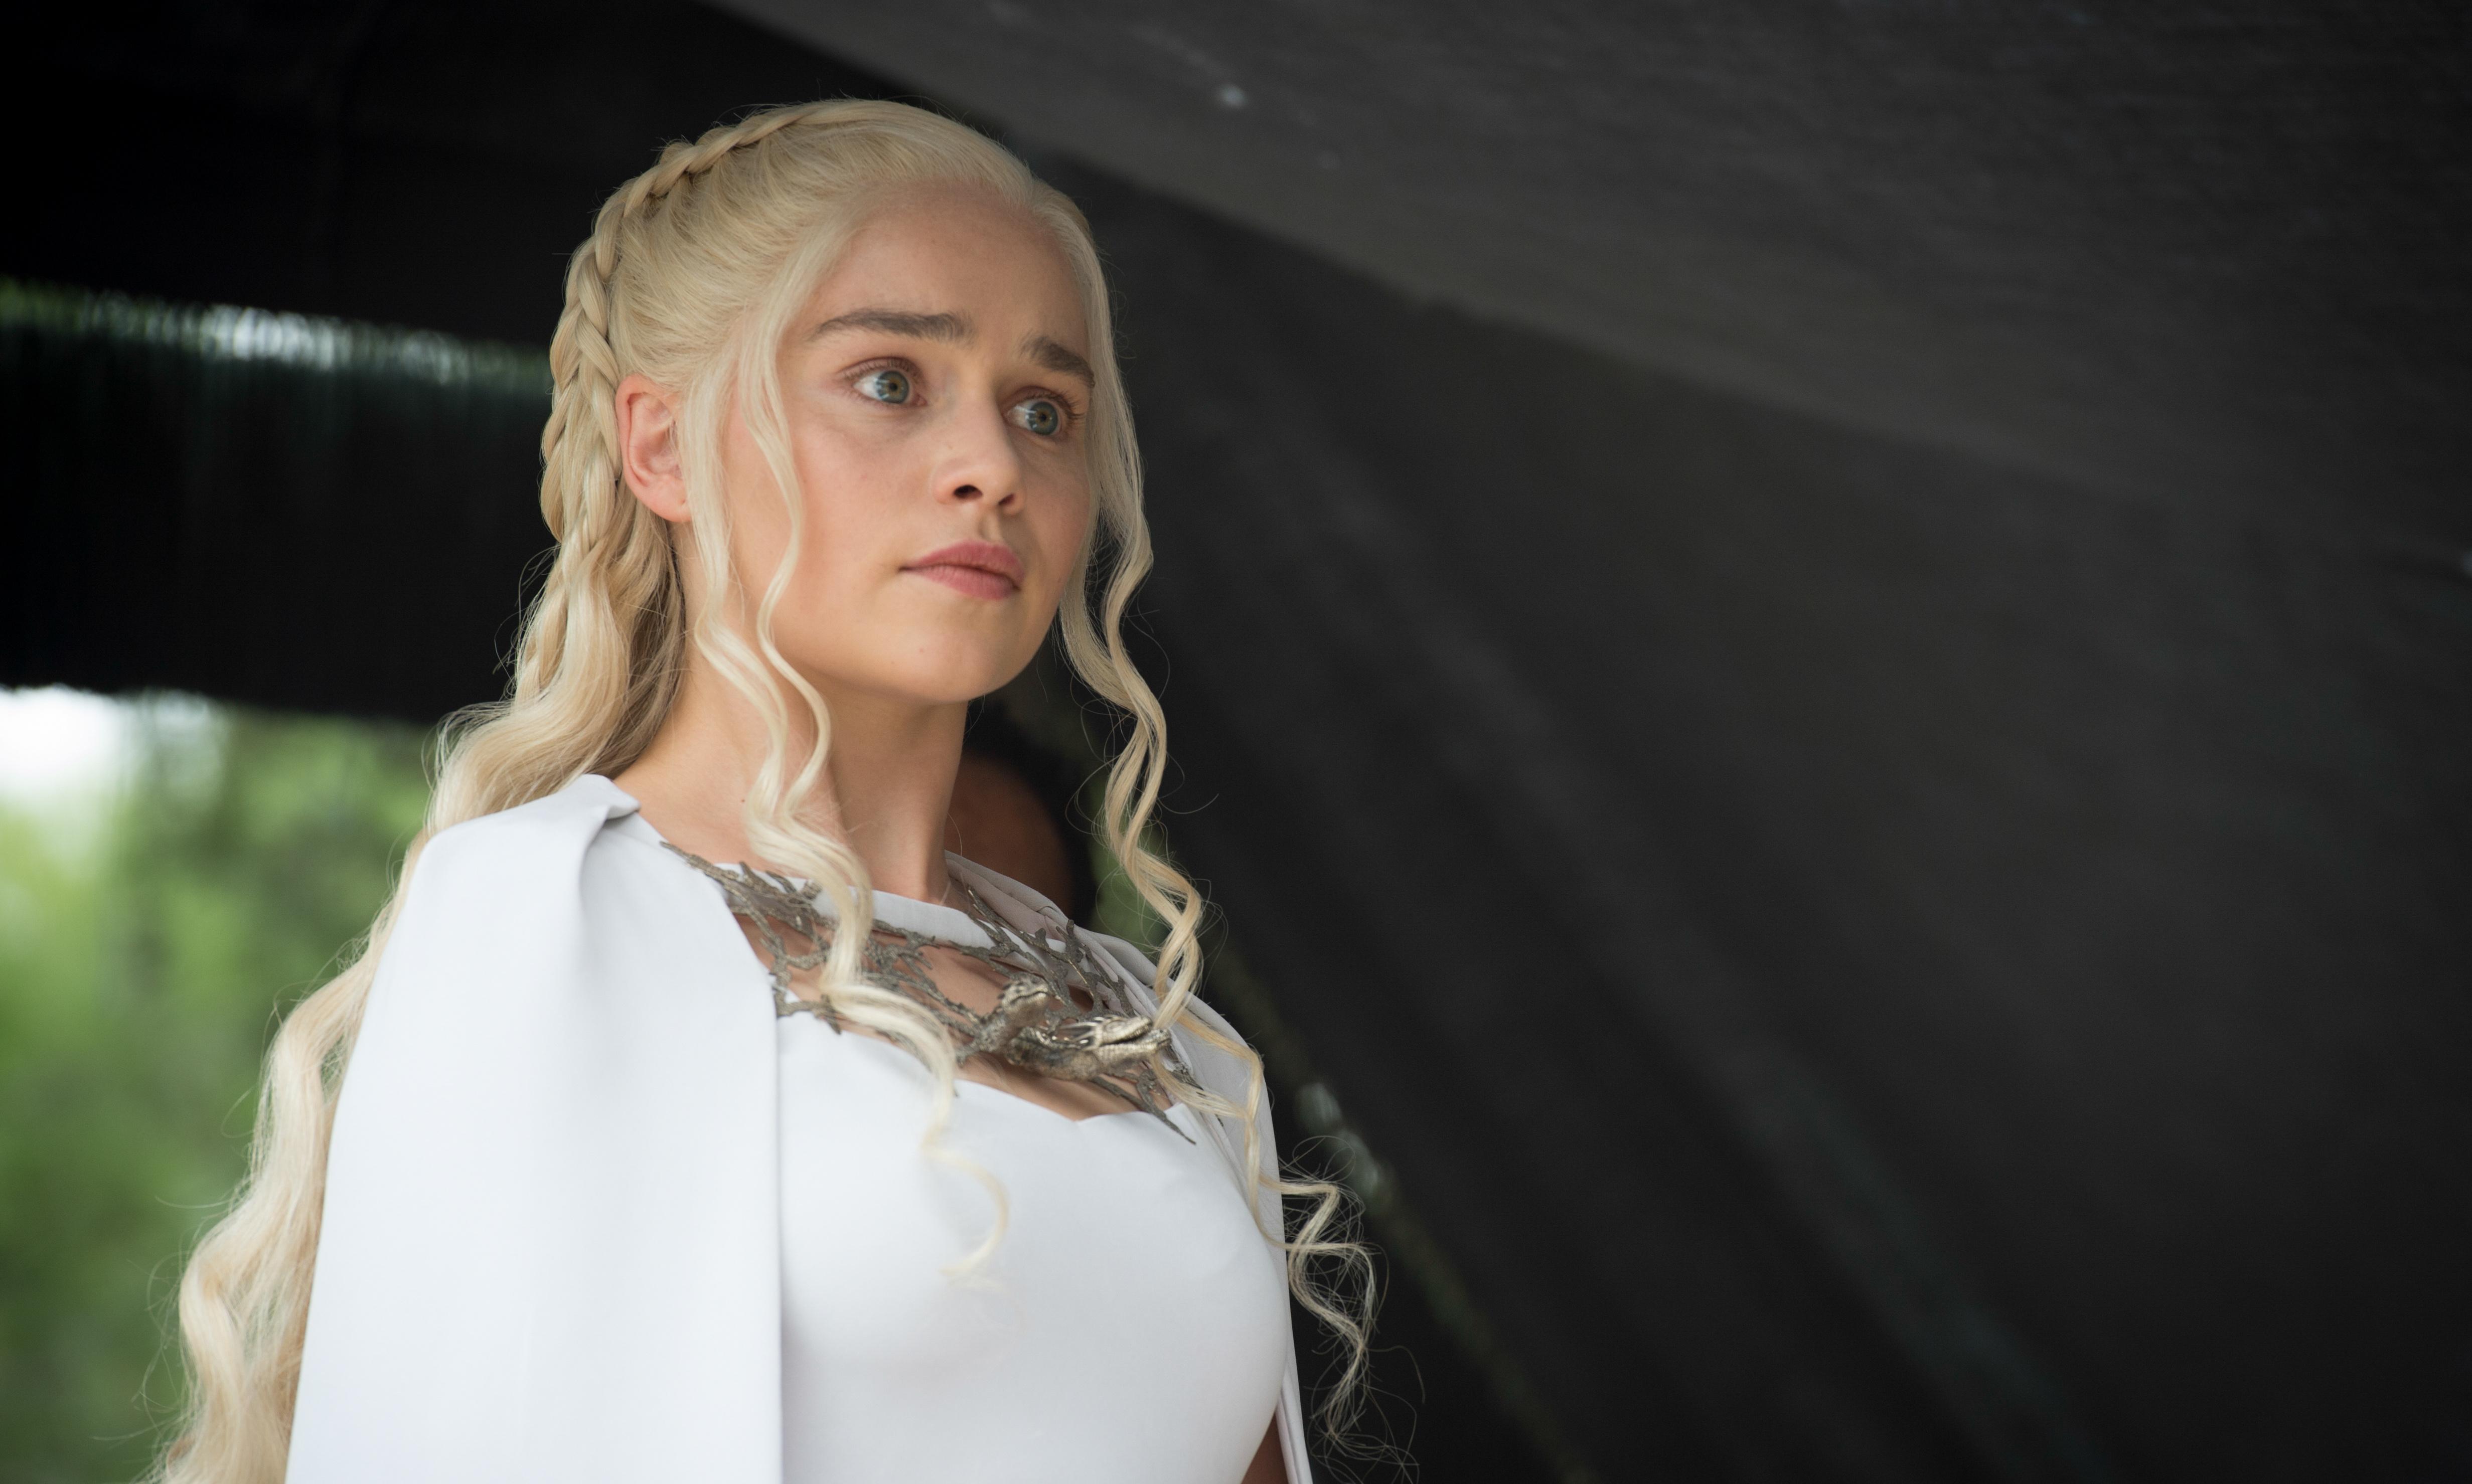 Emilia Clarke: Game of Thrones nude scenes were 'terrifying'